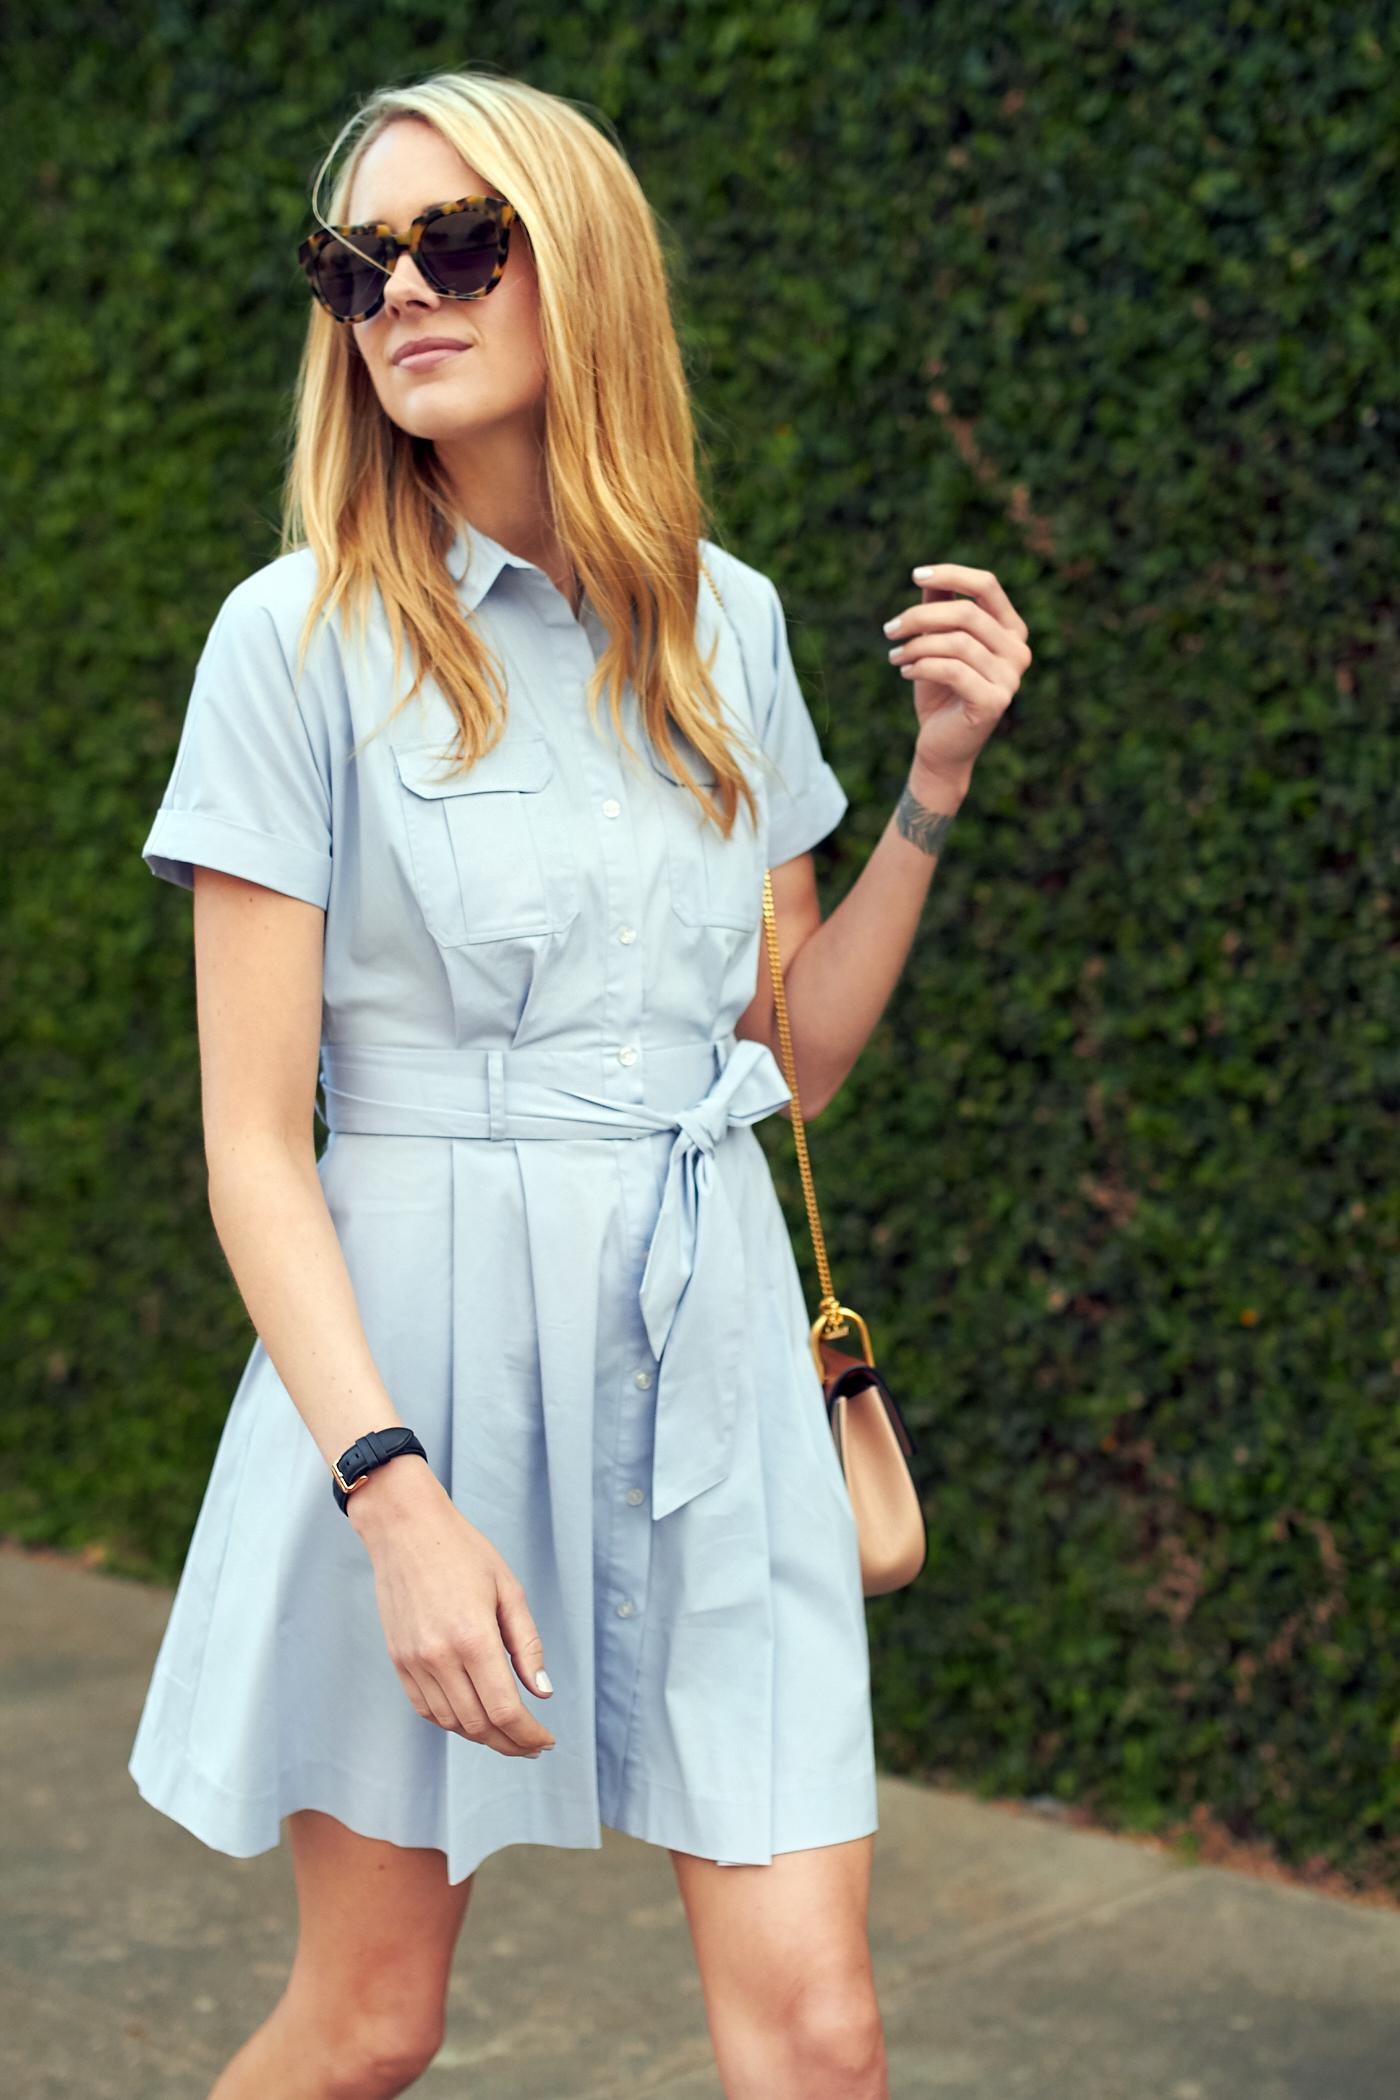 fashion-jackson-cynthia-steffe-nordstrom-blue-shirtdress-karen-walker-sunglasses